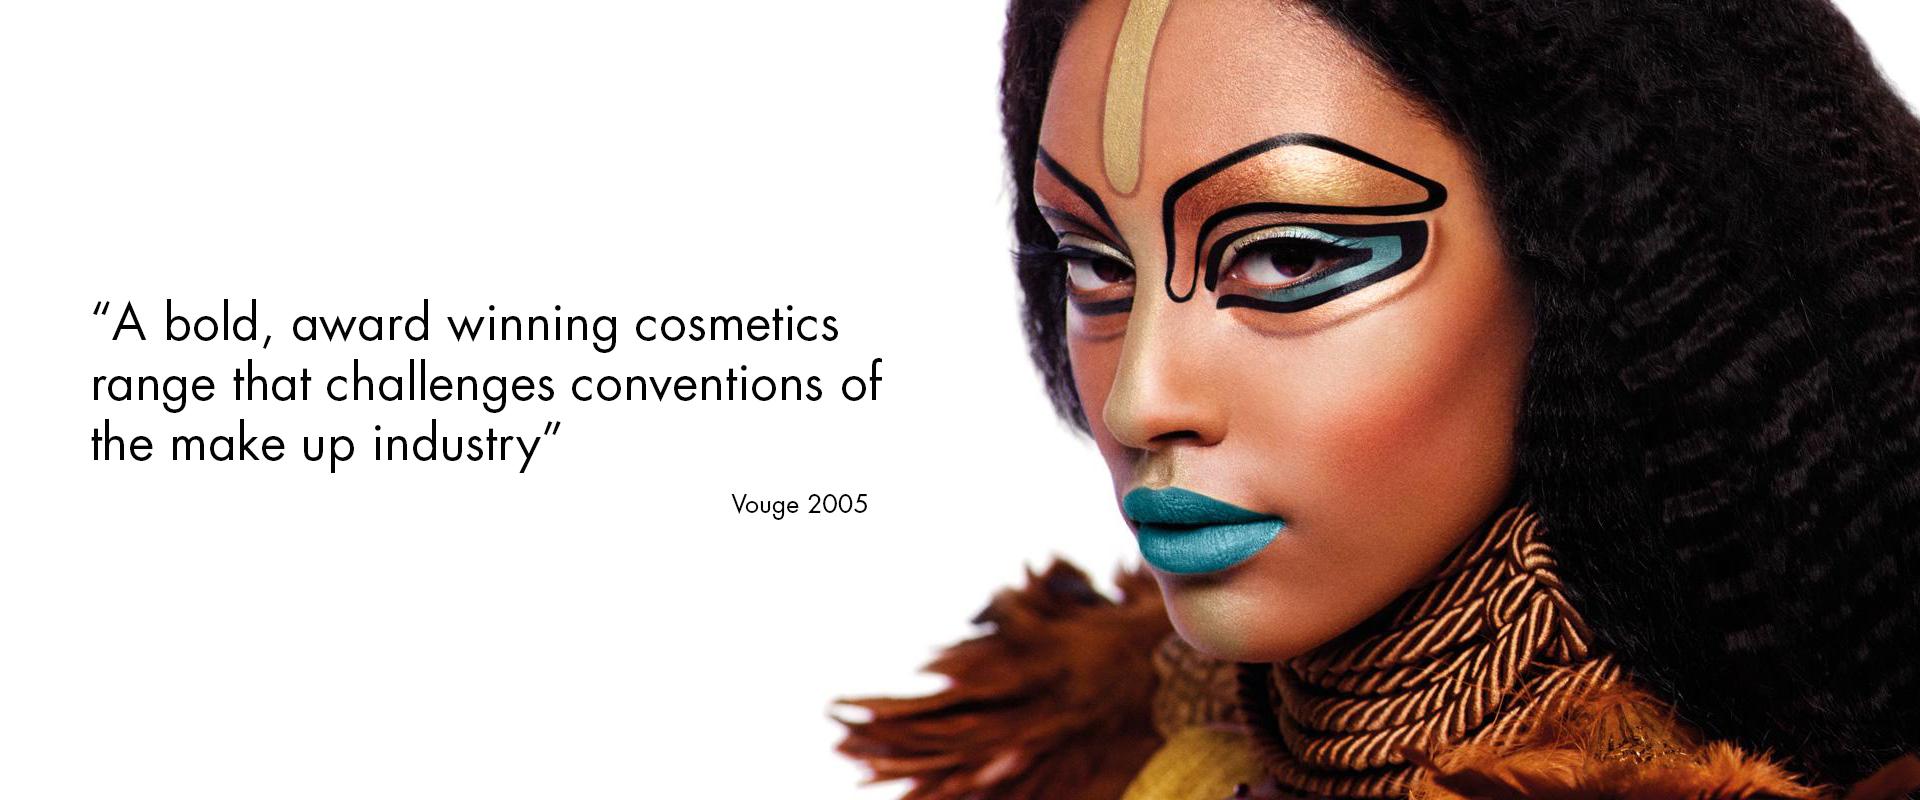 Illamasqua - curventa - makeup - range - brand - beauty - photography - coolbrands - cult brand - vogue - bold - cosmetics